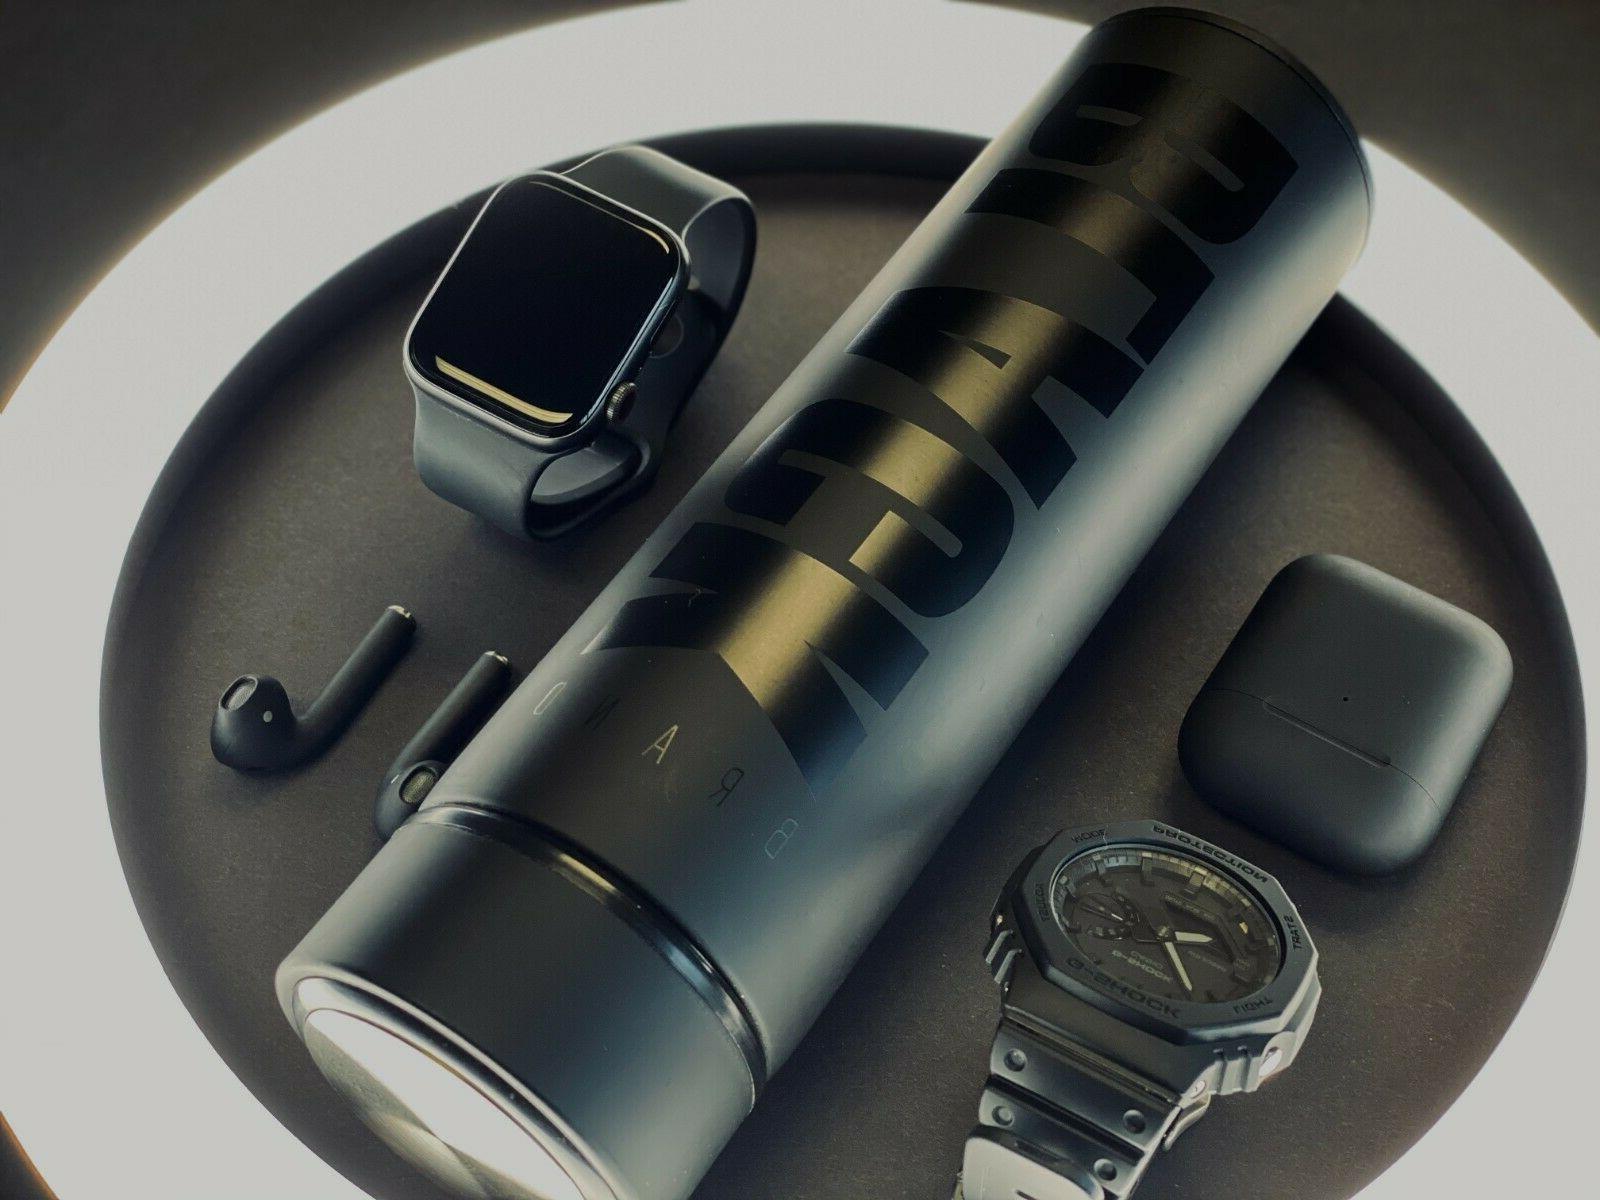 16 oz Vacuum Steel Thermos Cup Mug BLACK BRAND